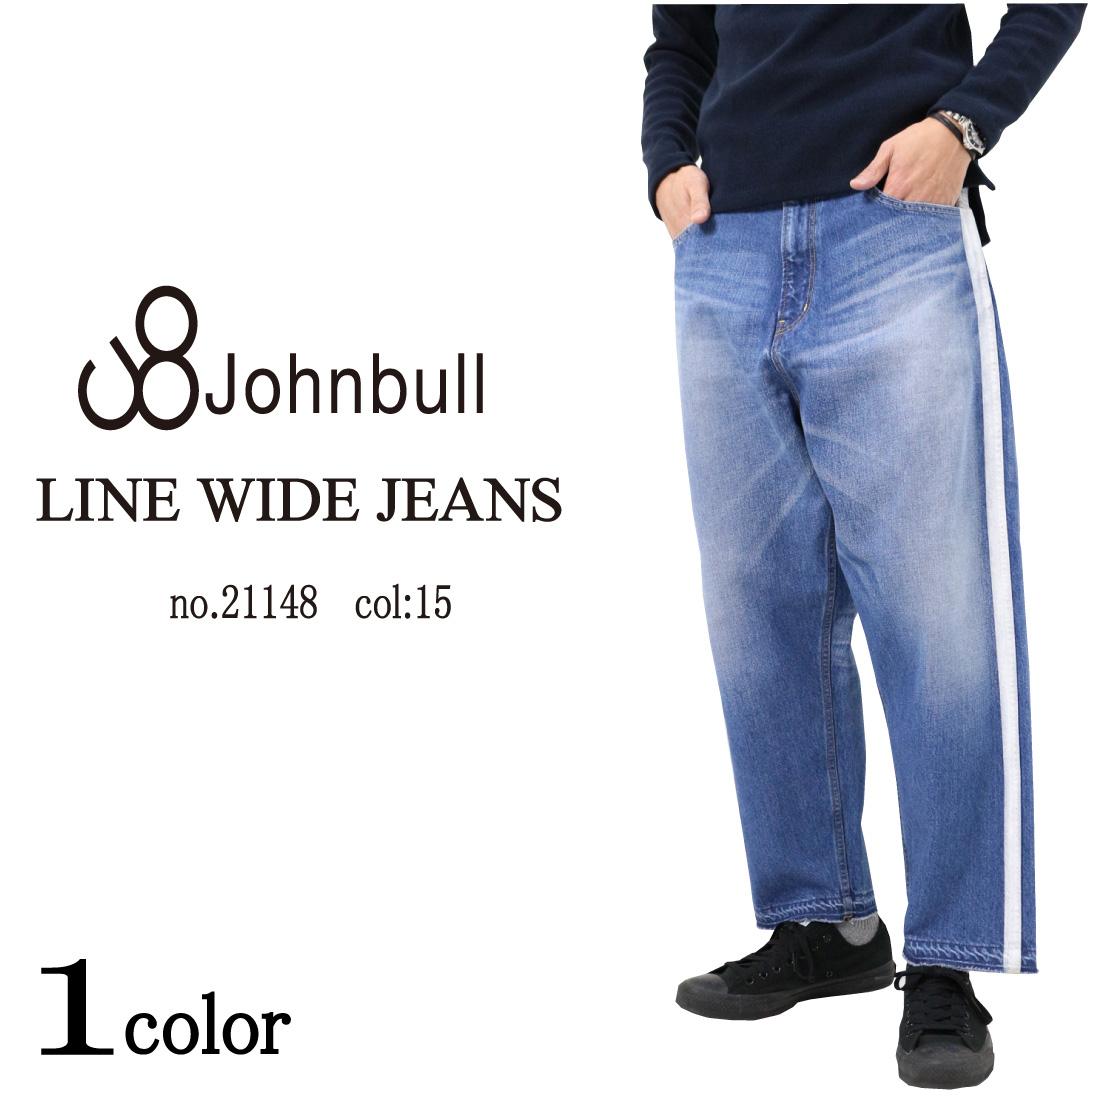 JOHNBULL ジョンブル 21148 ライン ワイド ジーンズ デニム テーパード 15 ユーズド加工 ブルー メンズ トレンド M/L